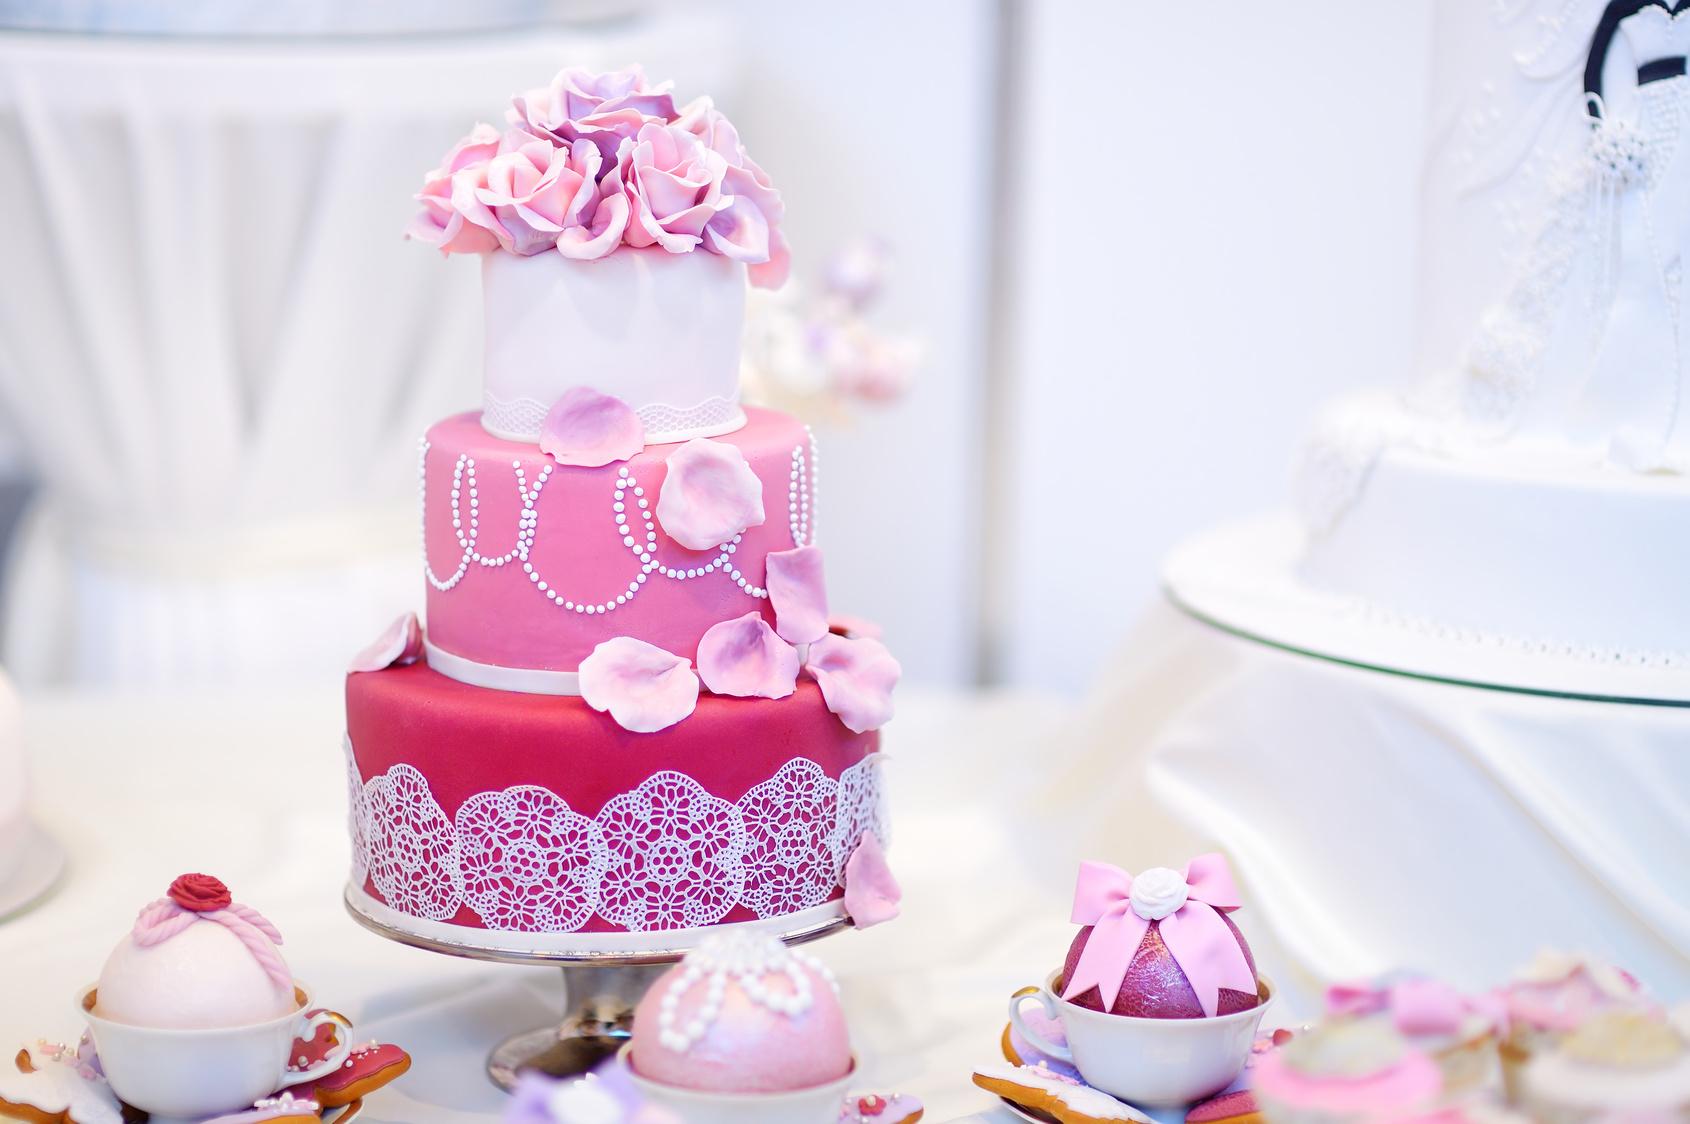 Růžový dort - nové foto